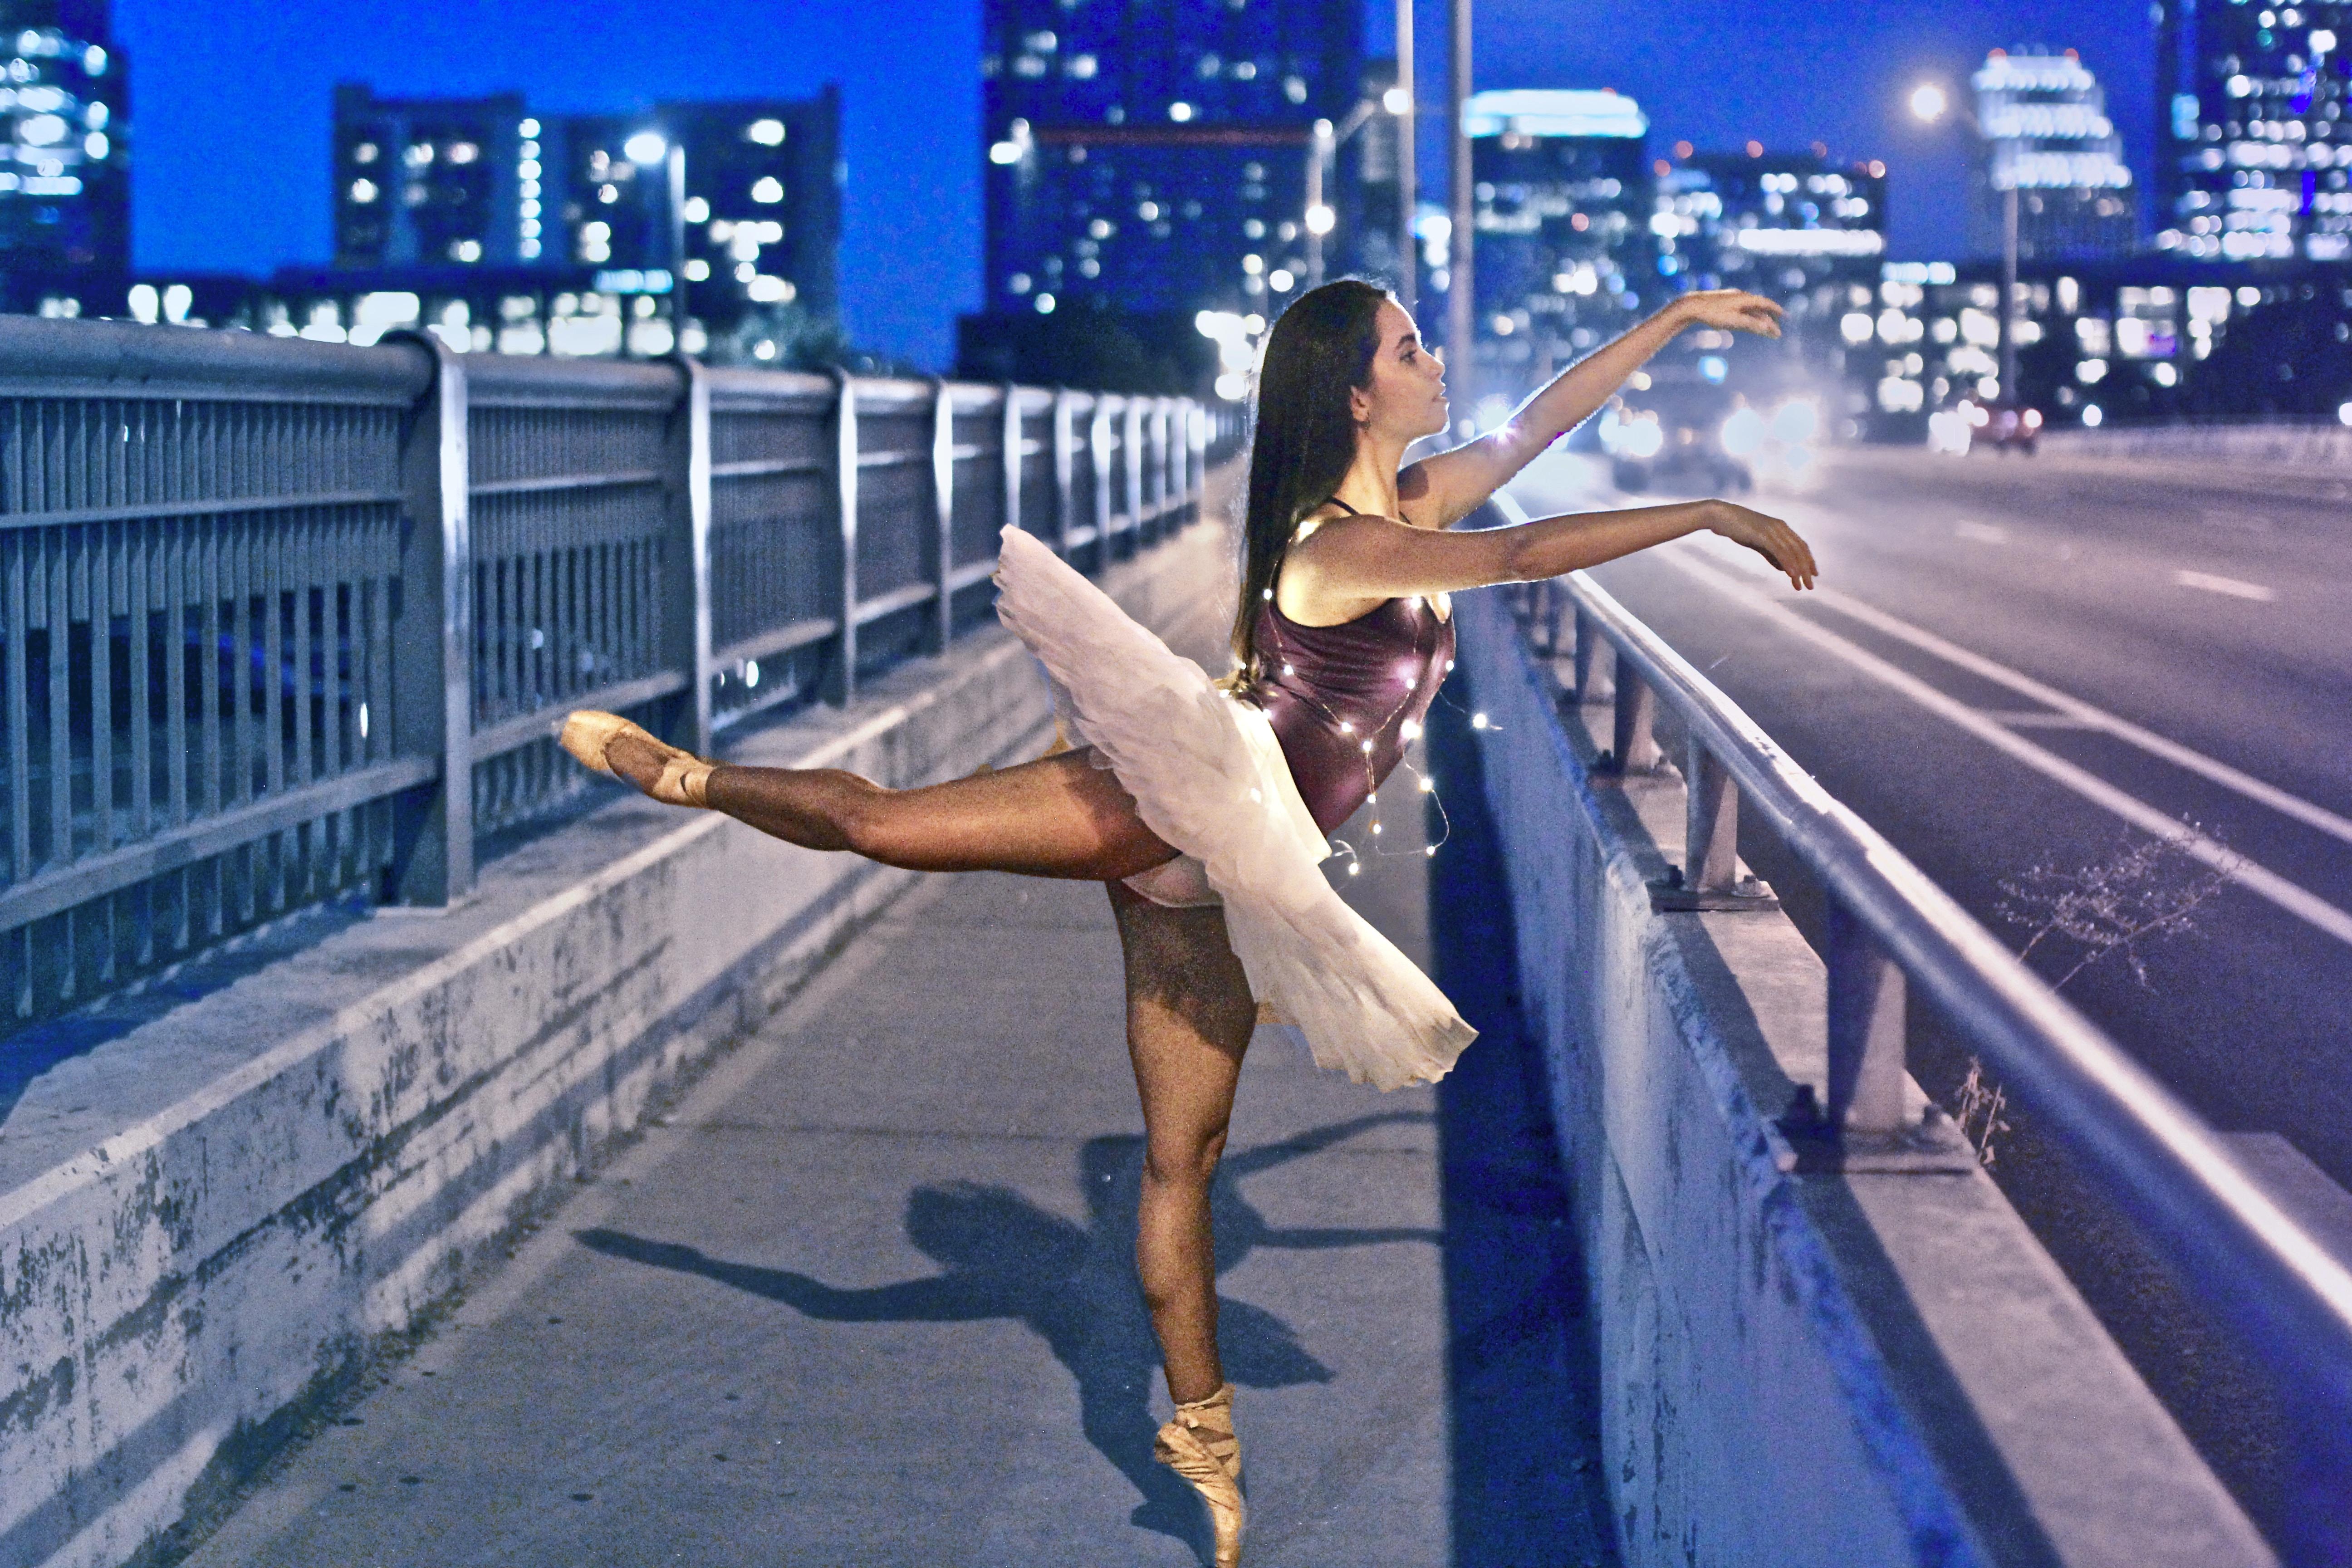 woman wearing ballet dress at roadside dancing